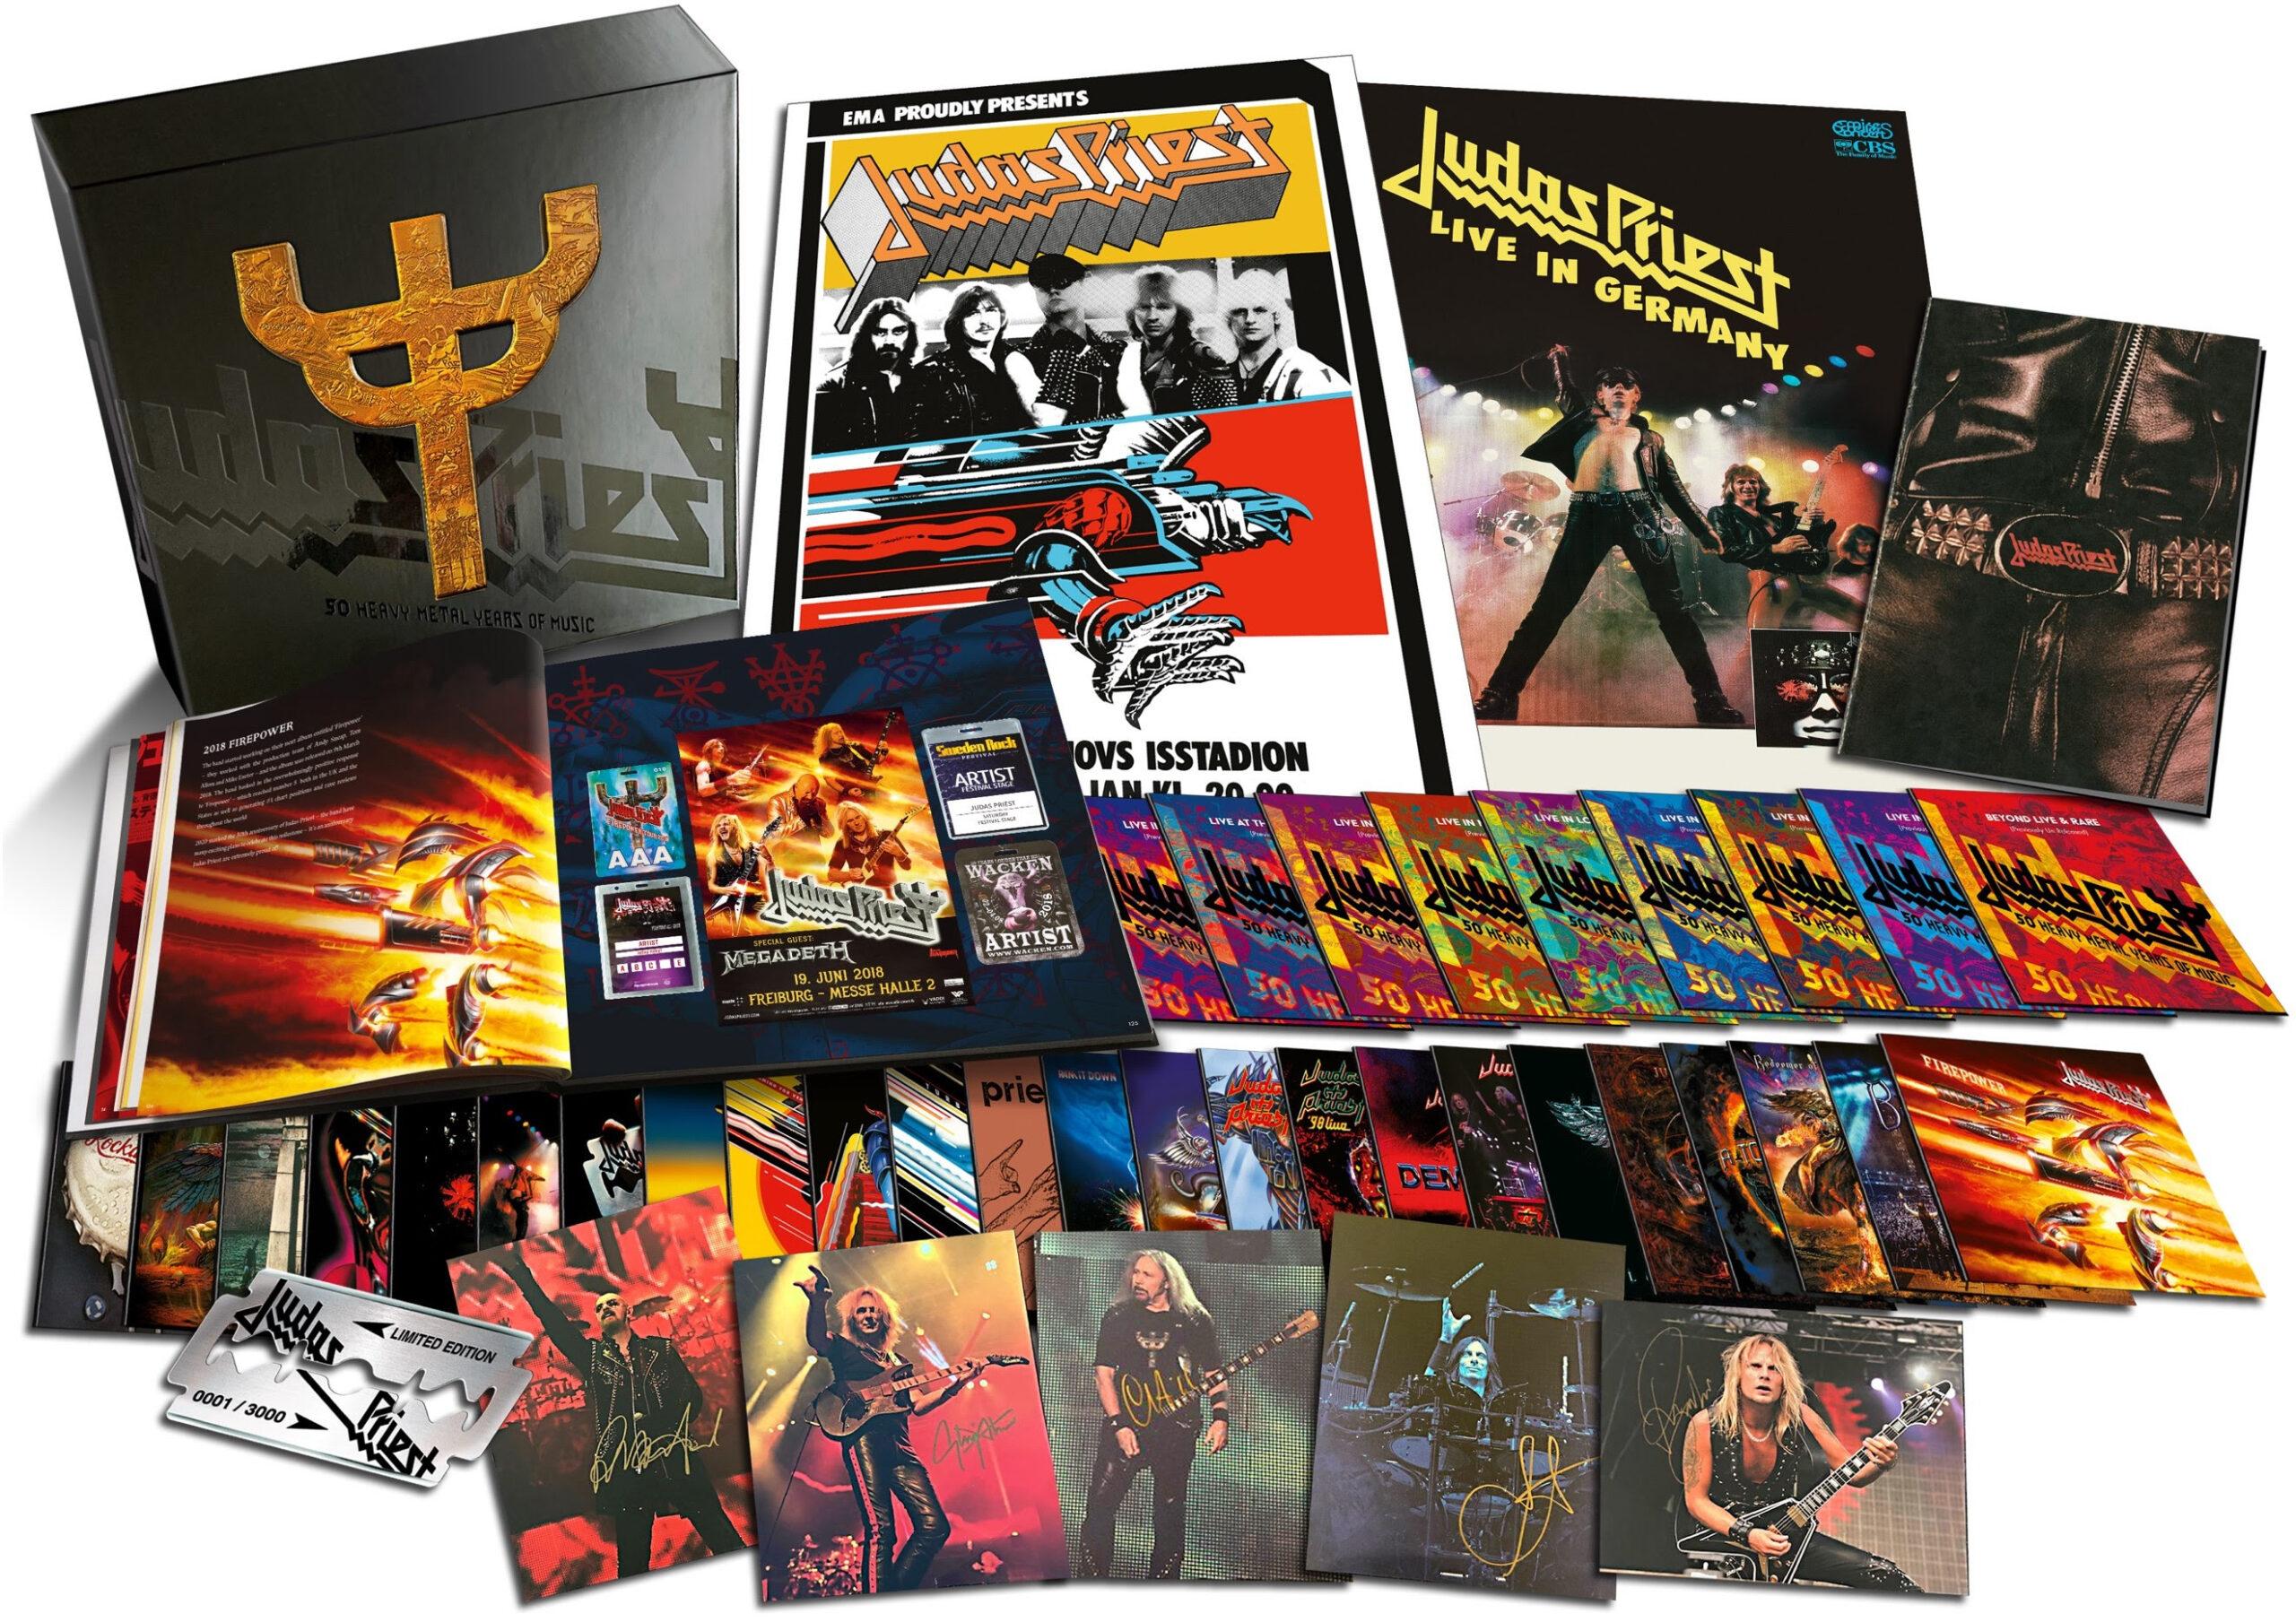 50 heavy metal years of music judas priest boxset